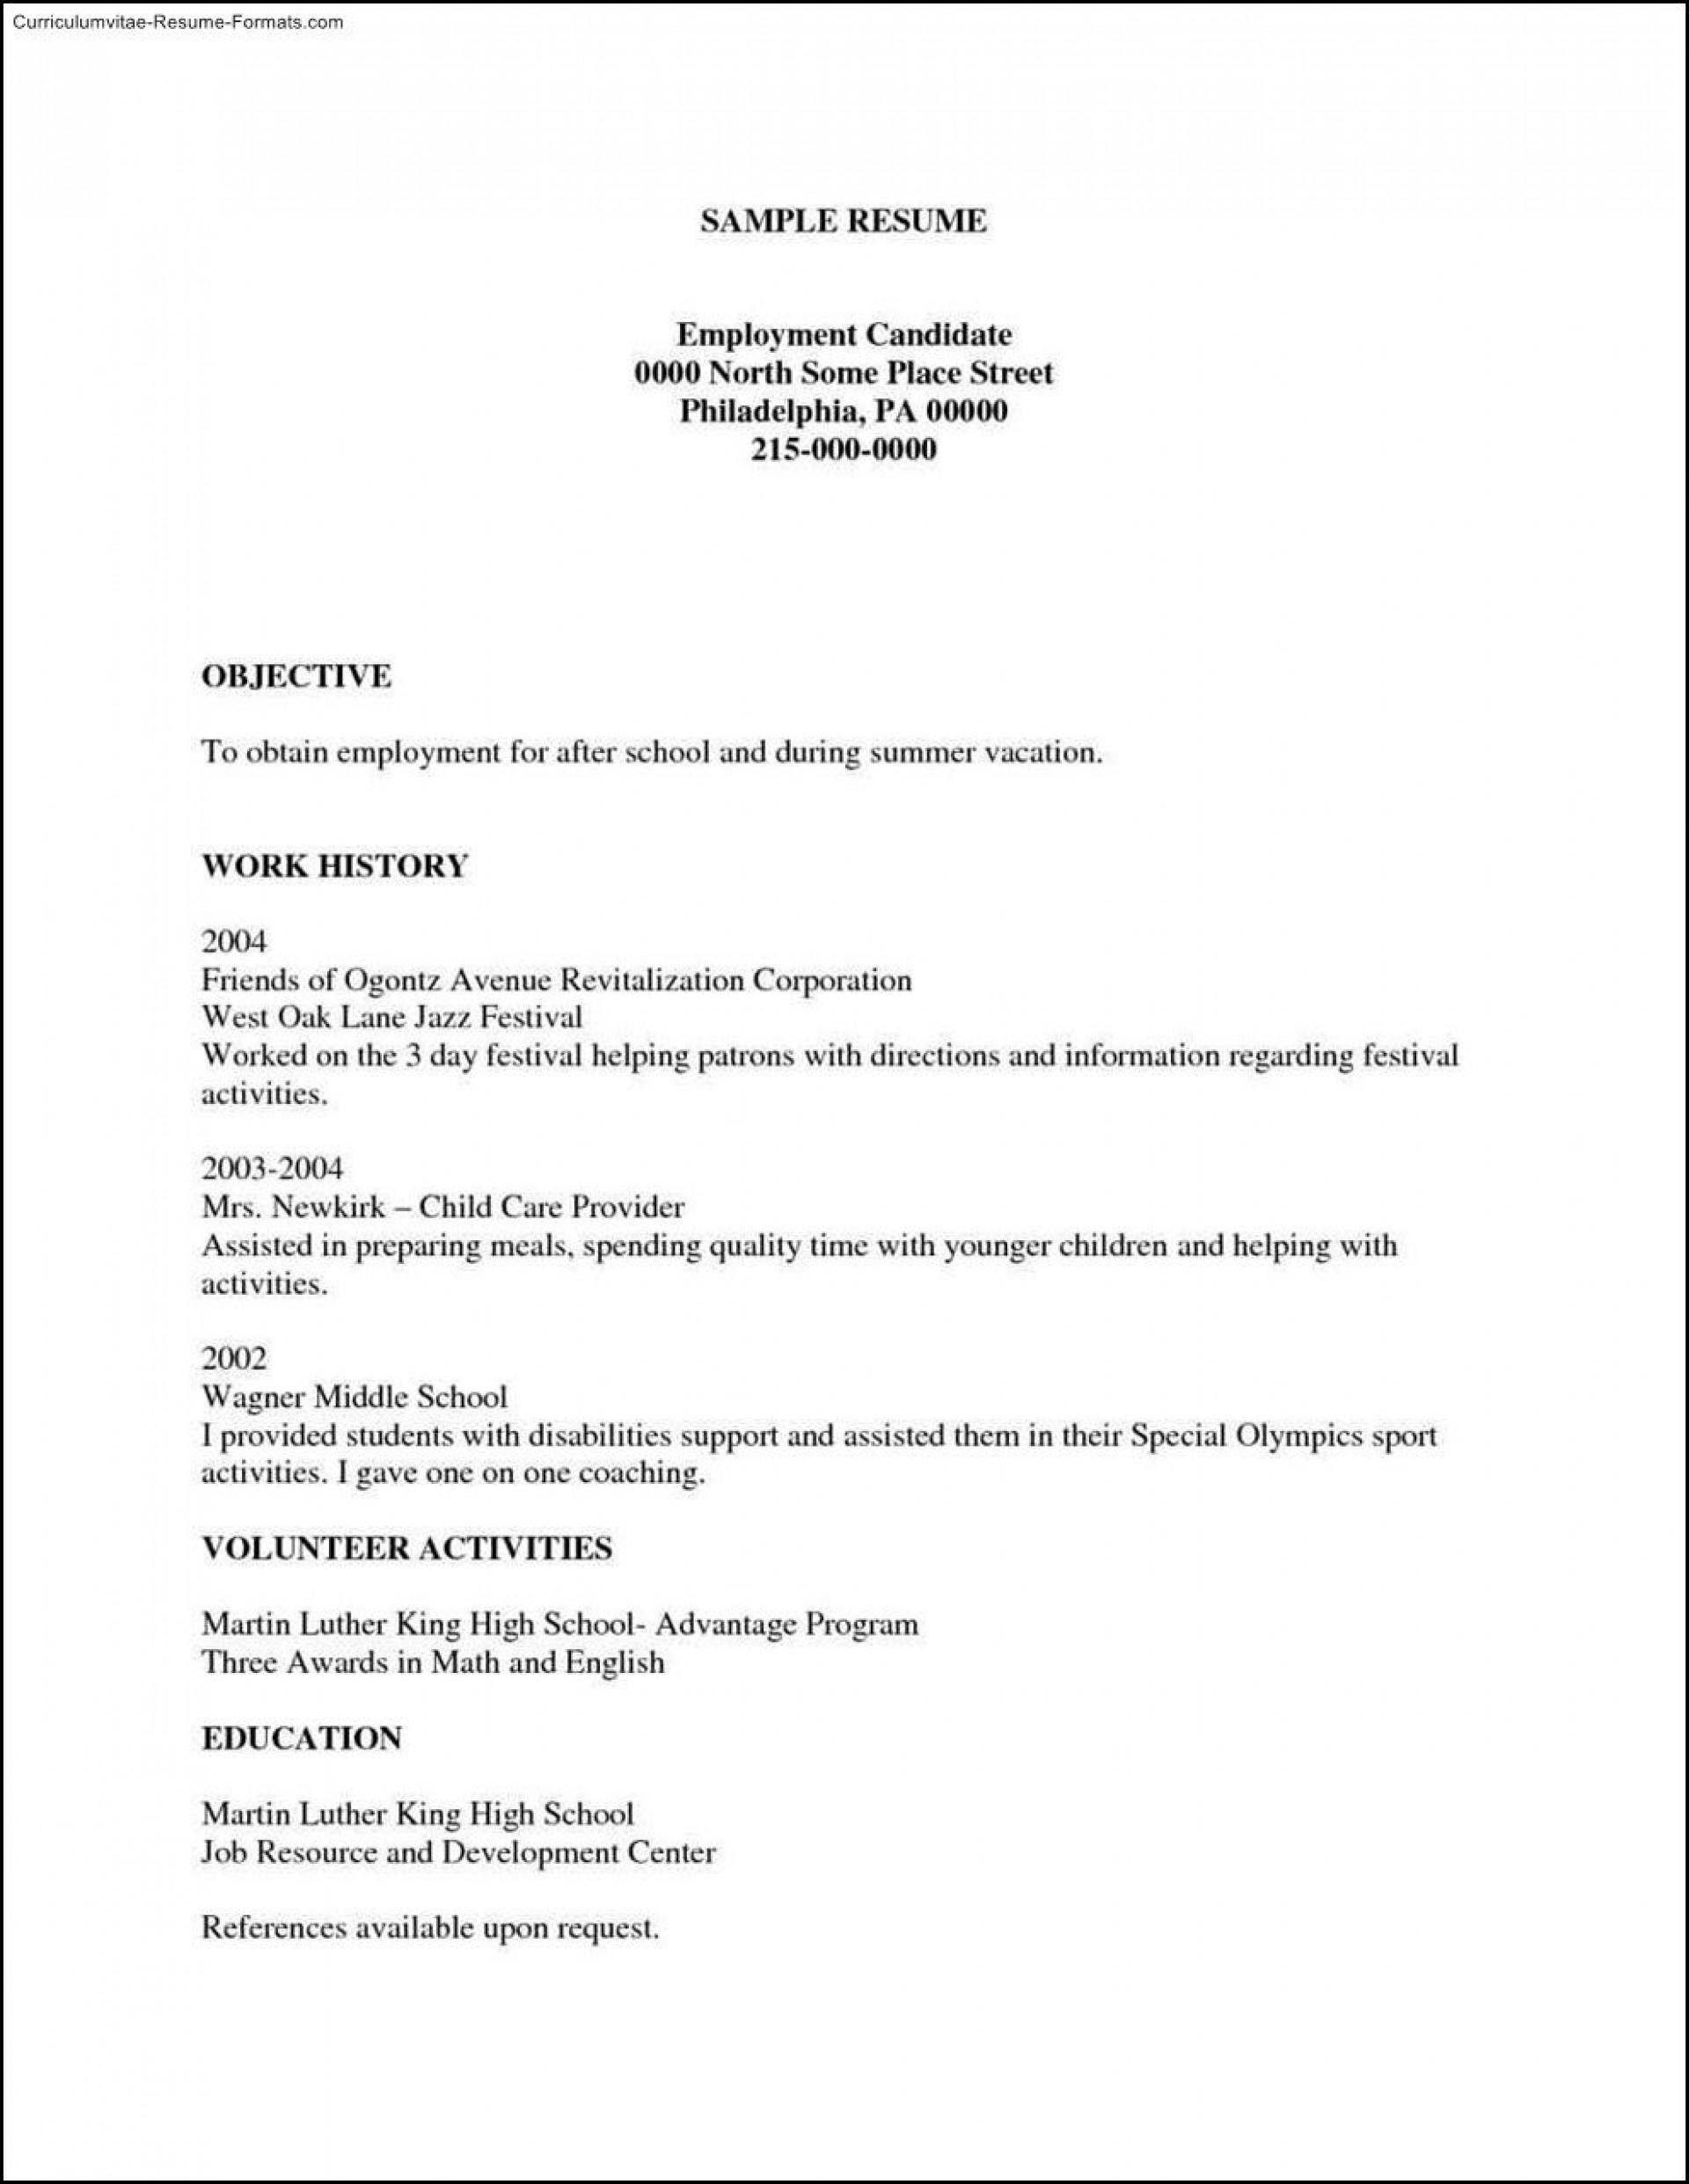 008 Astounding Free Printable Resume Template 2018 Highest Quality 1920